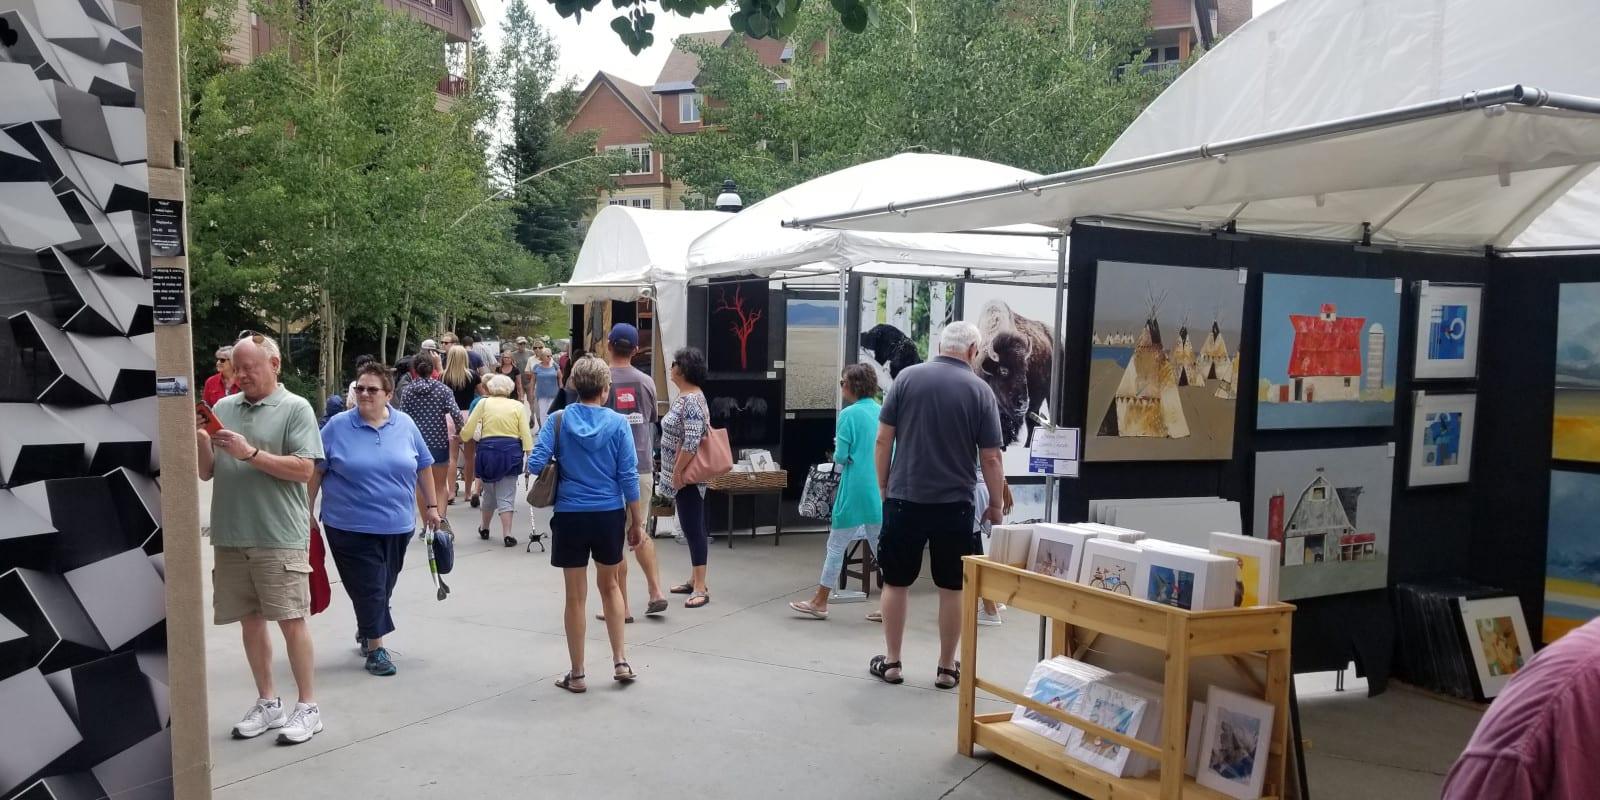 Breckenridge Main Street Art Festival